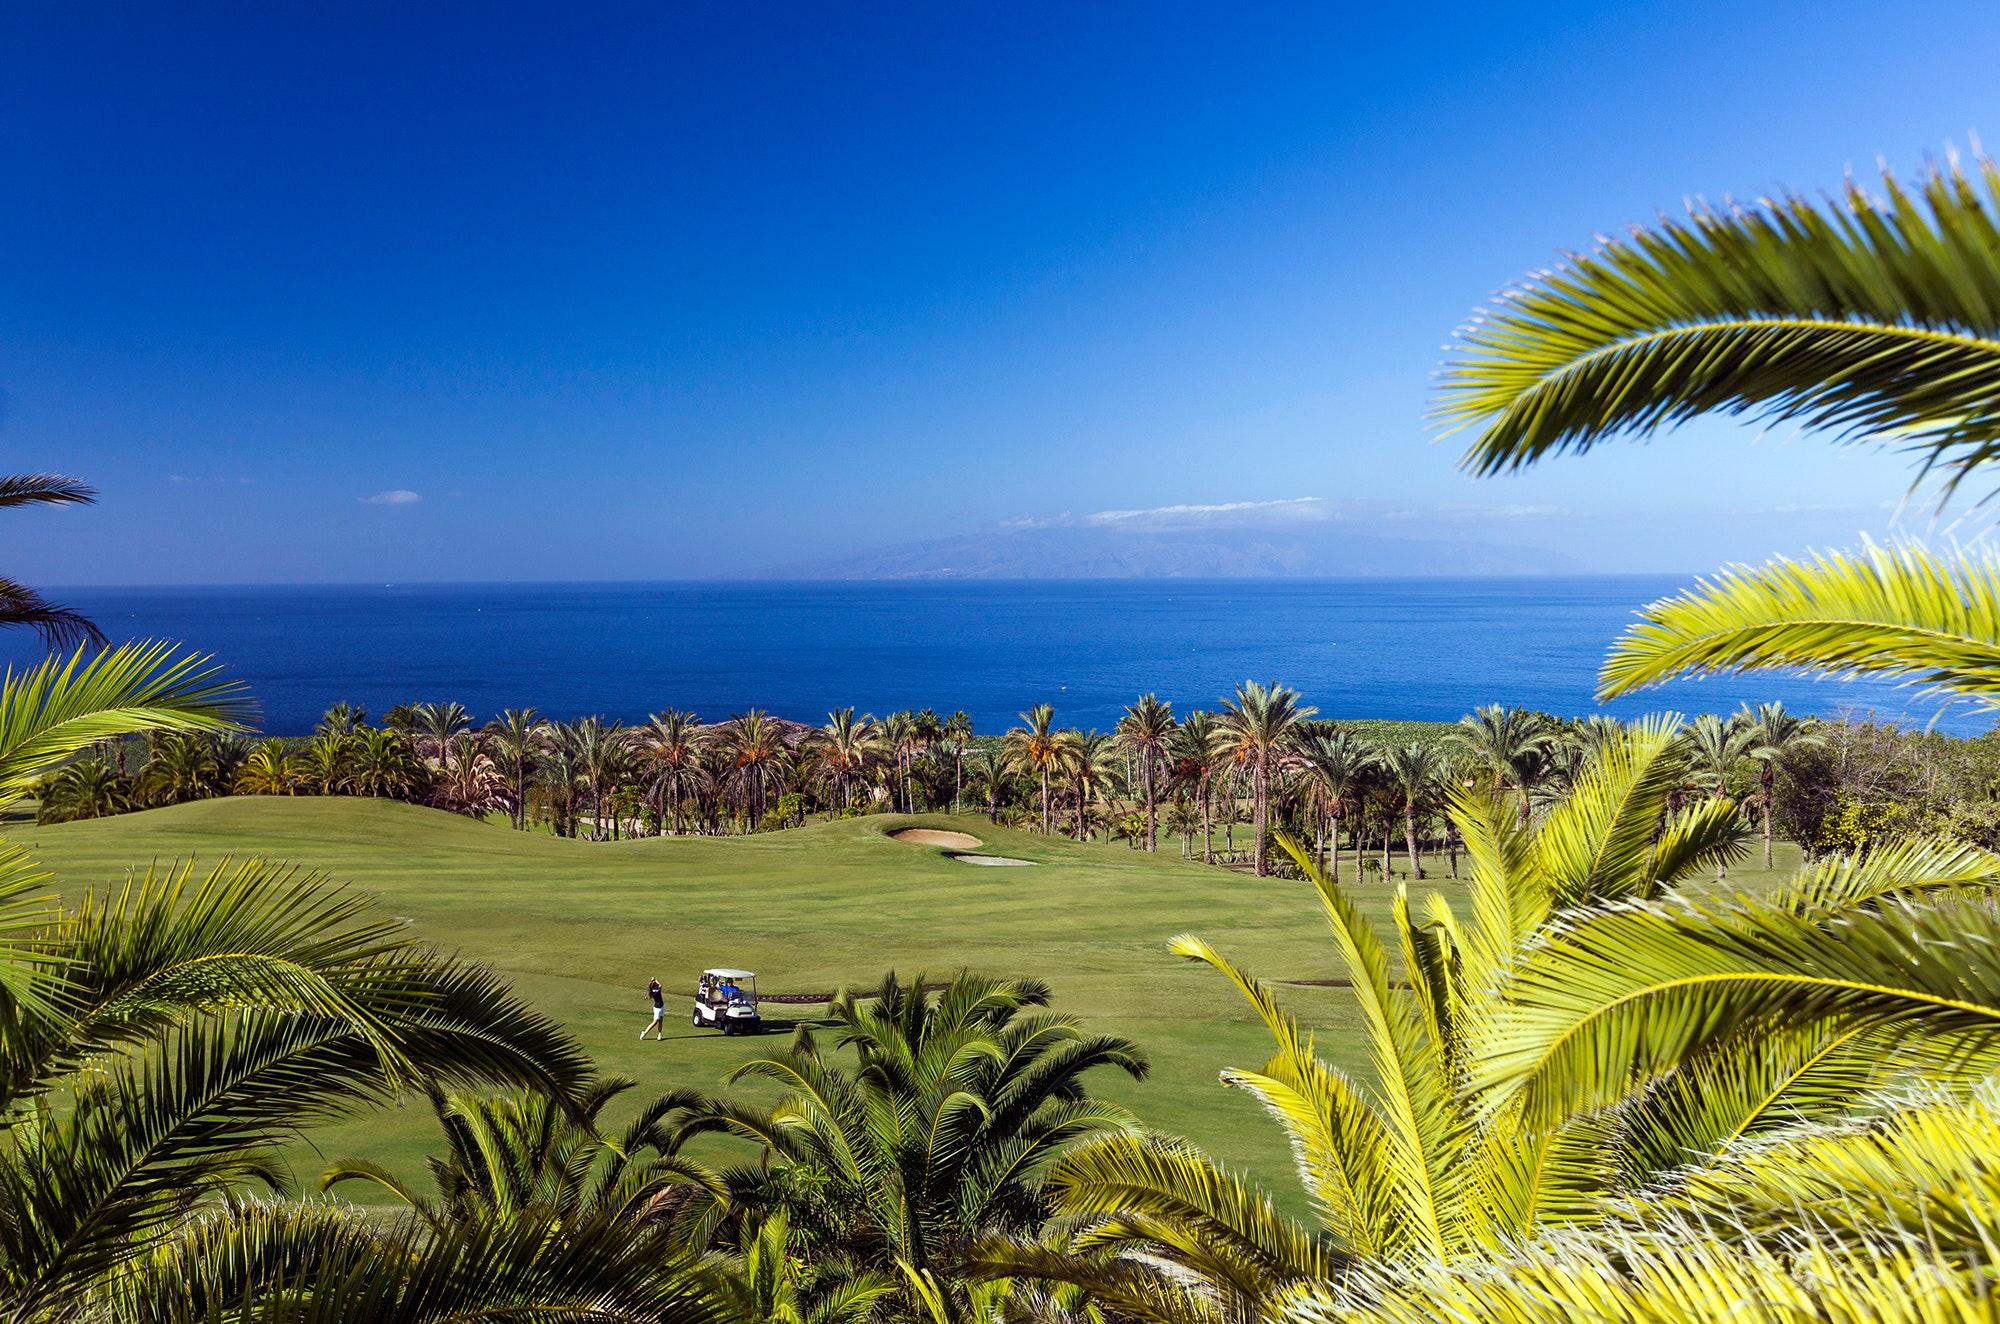 Hotel Jardin Tropical and Abama sweepstakes